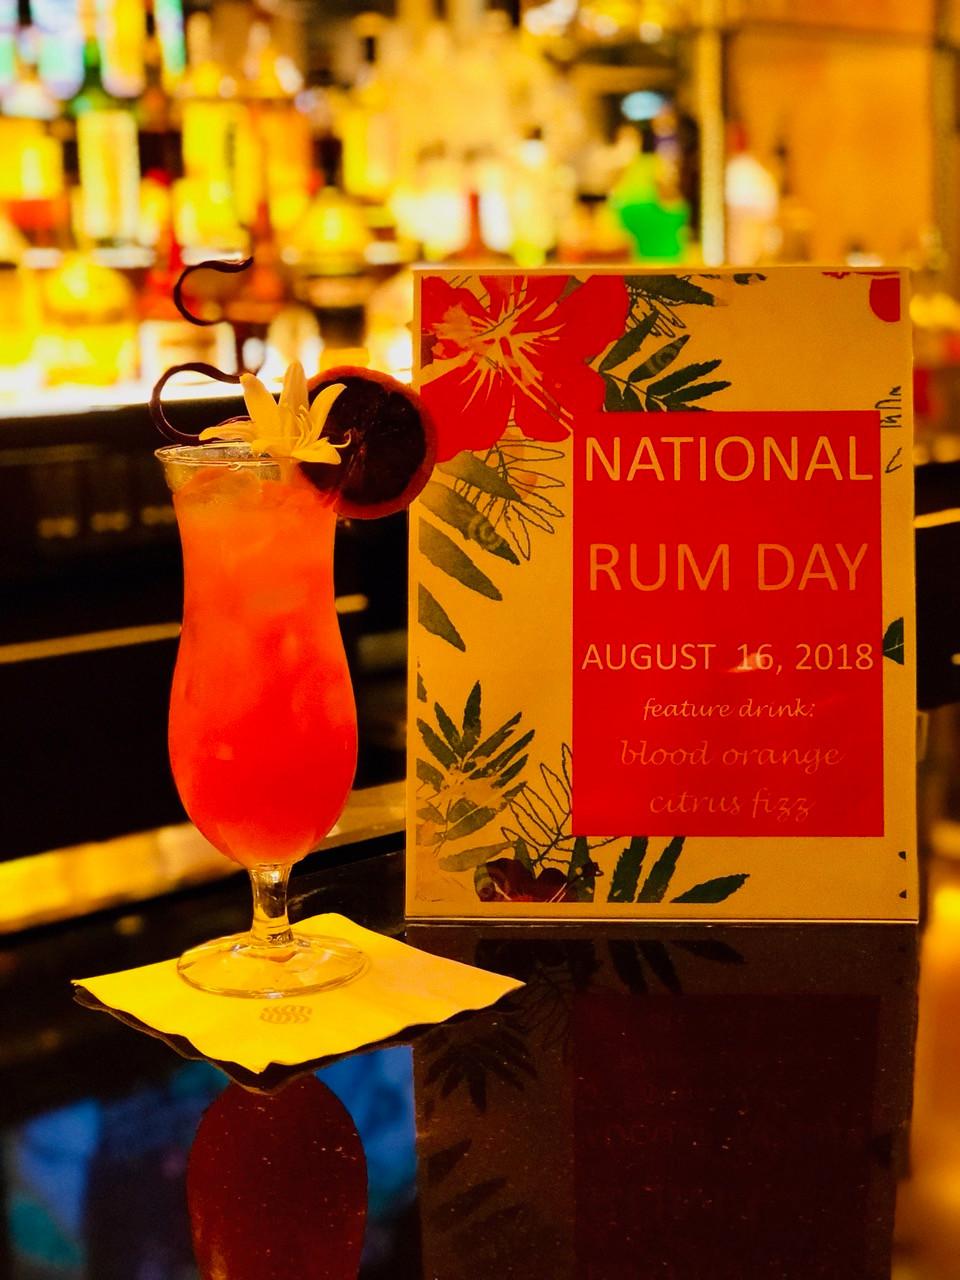 Sonesta Gwinnett Place Atlanta Celebrates National Rum Day